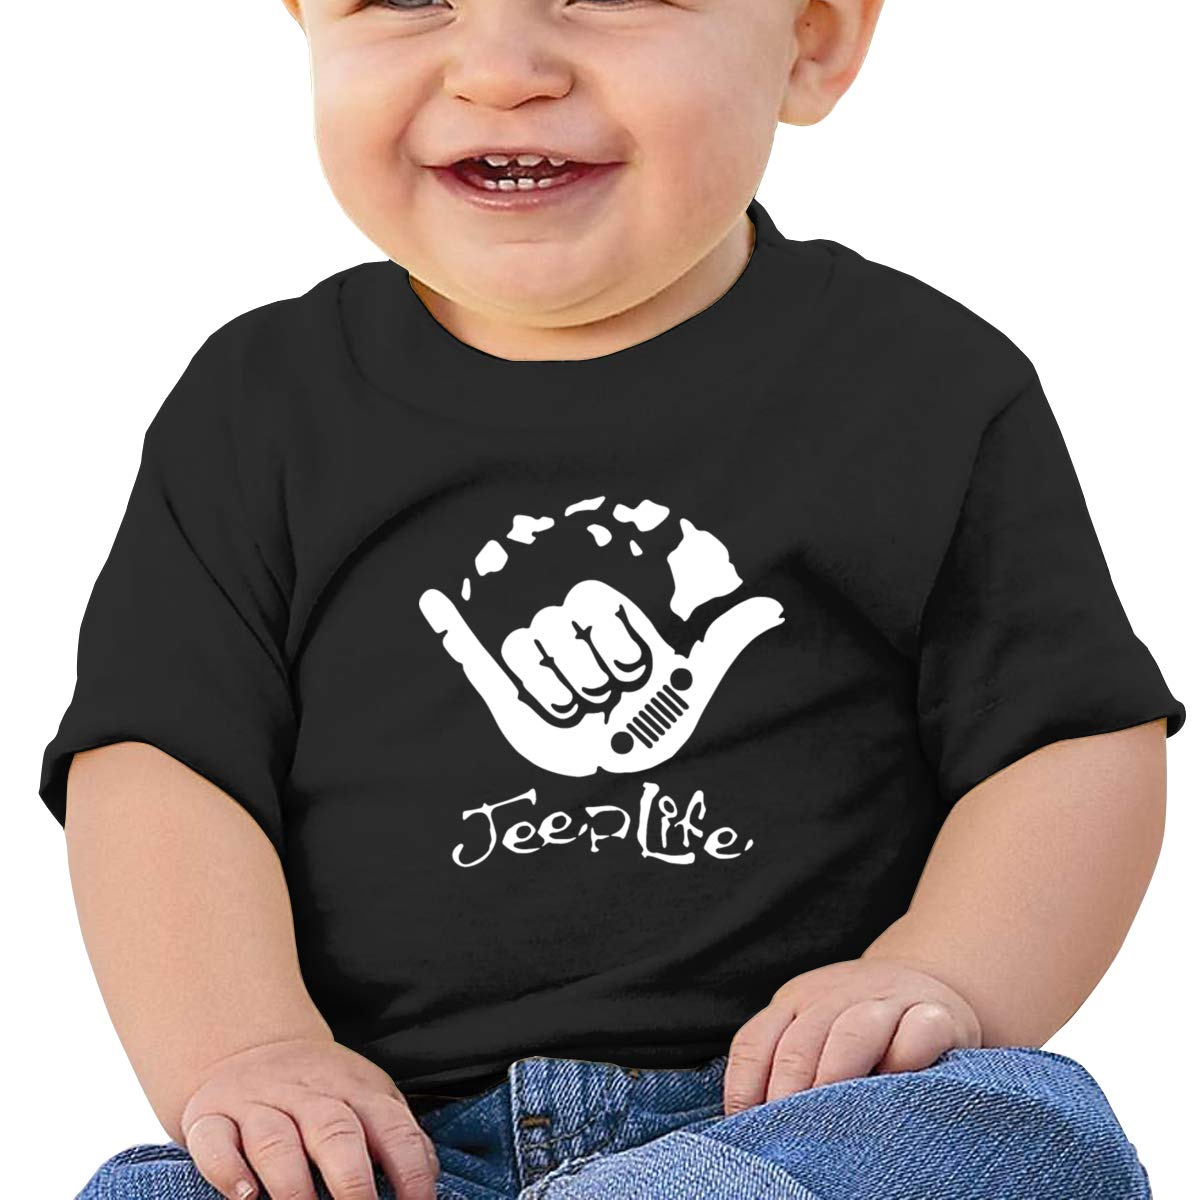 Jeep Life Short-Sleeves Shirts Baby Boy